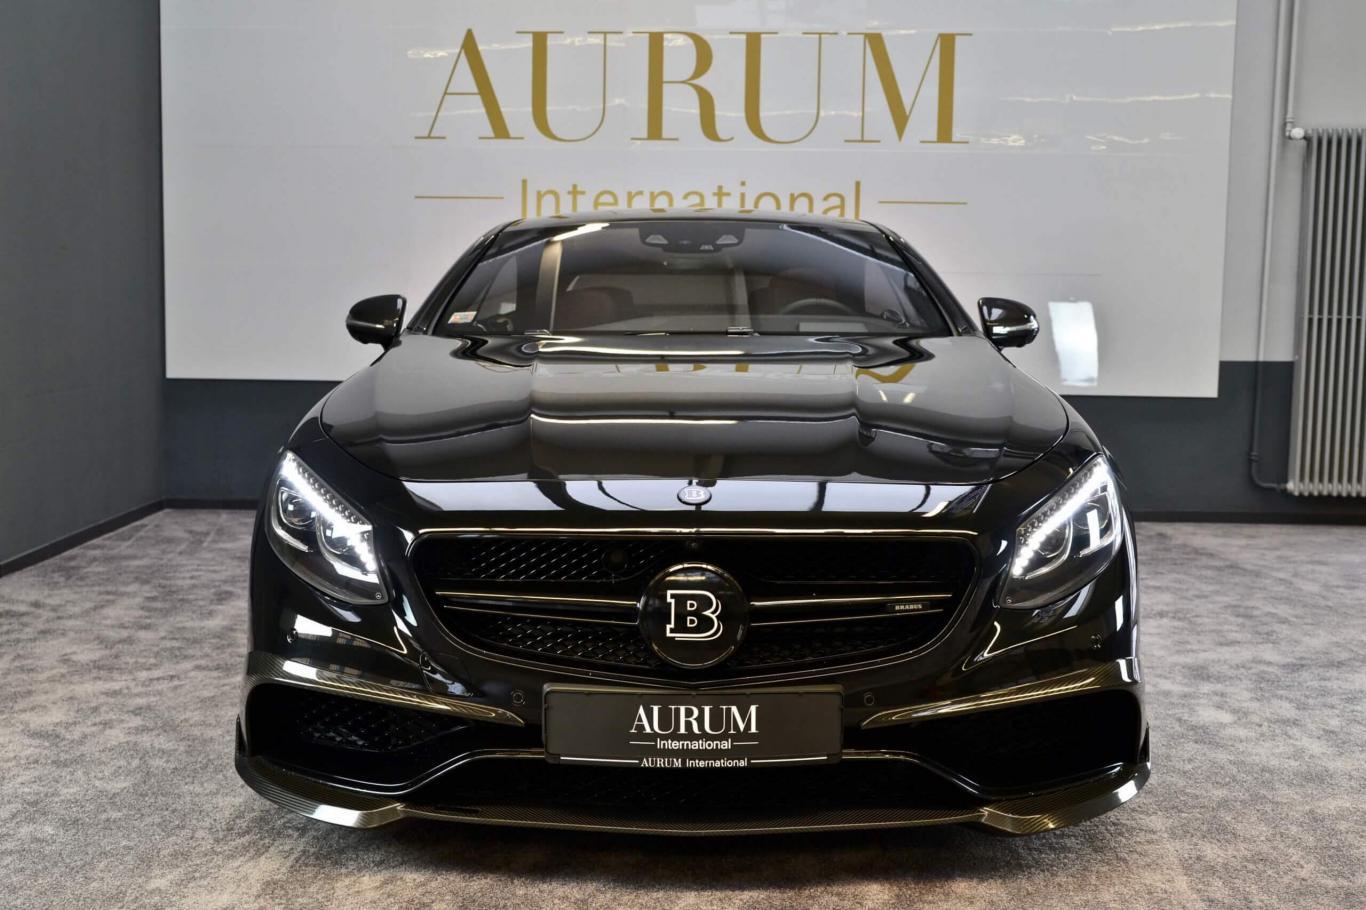 Mercedes Benz Brabus >> Mercedes Benz Brabus S730 Swar Keramik Carbon Full